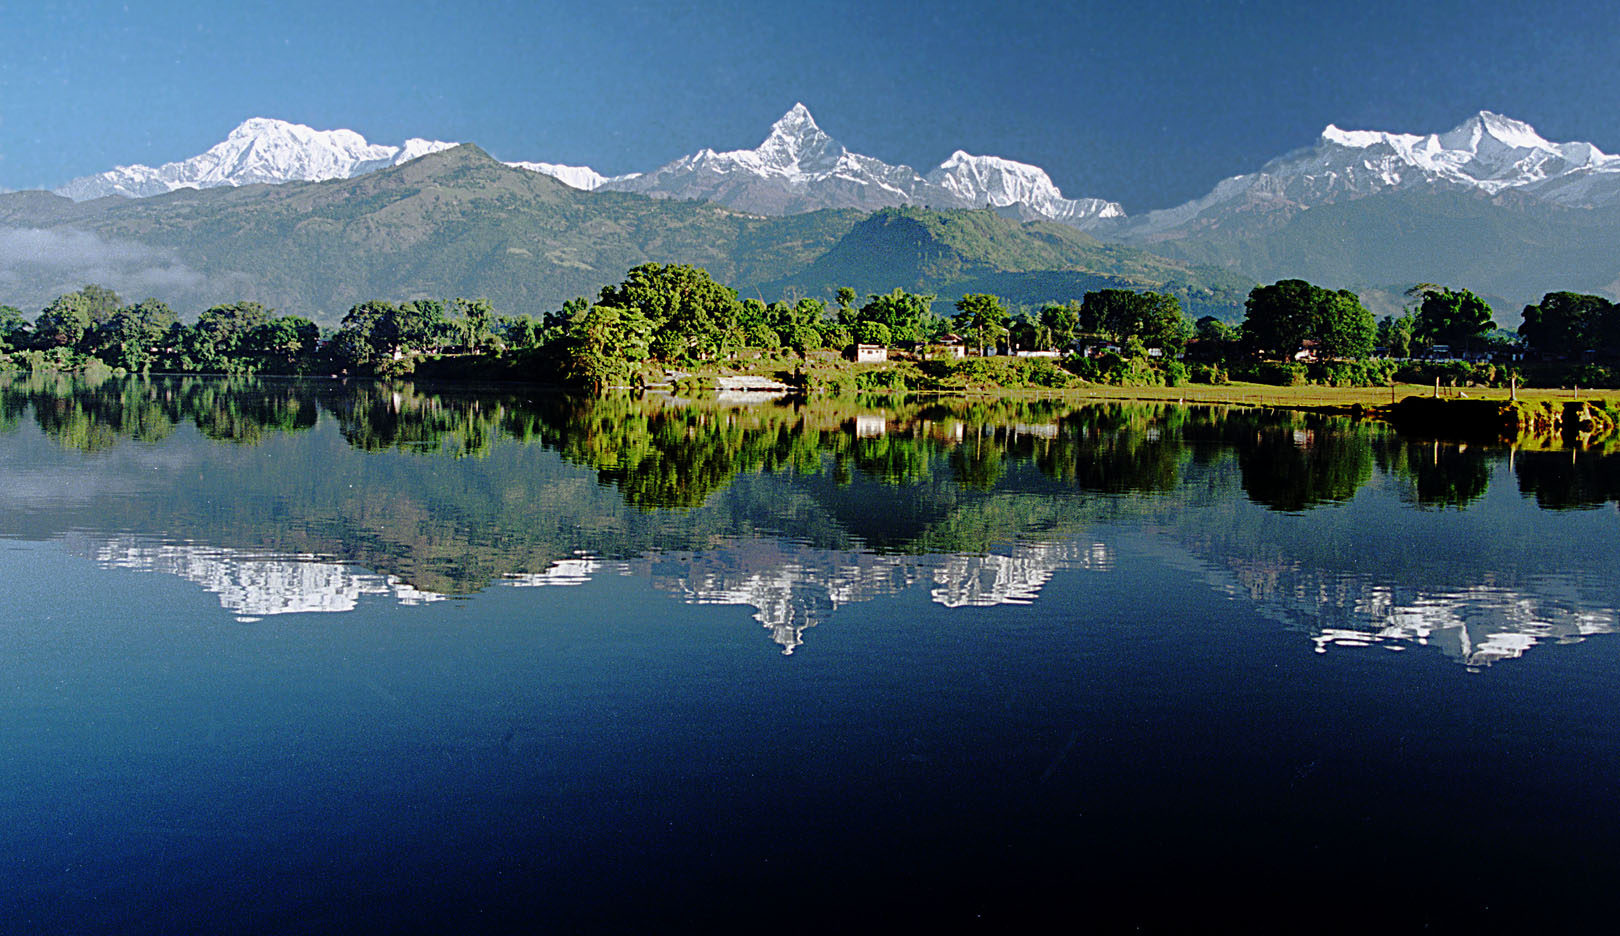 5 Days Nepal Tour: Short & Sweet (Budget)